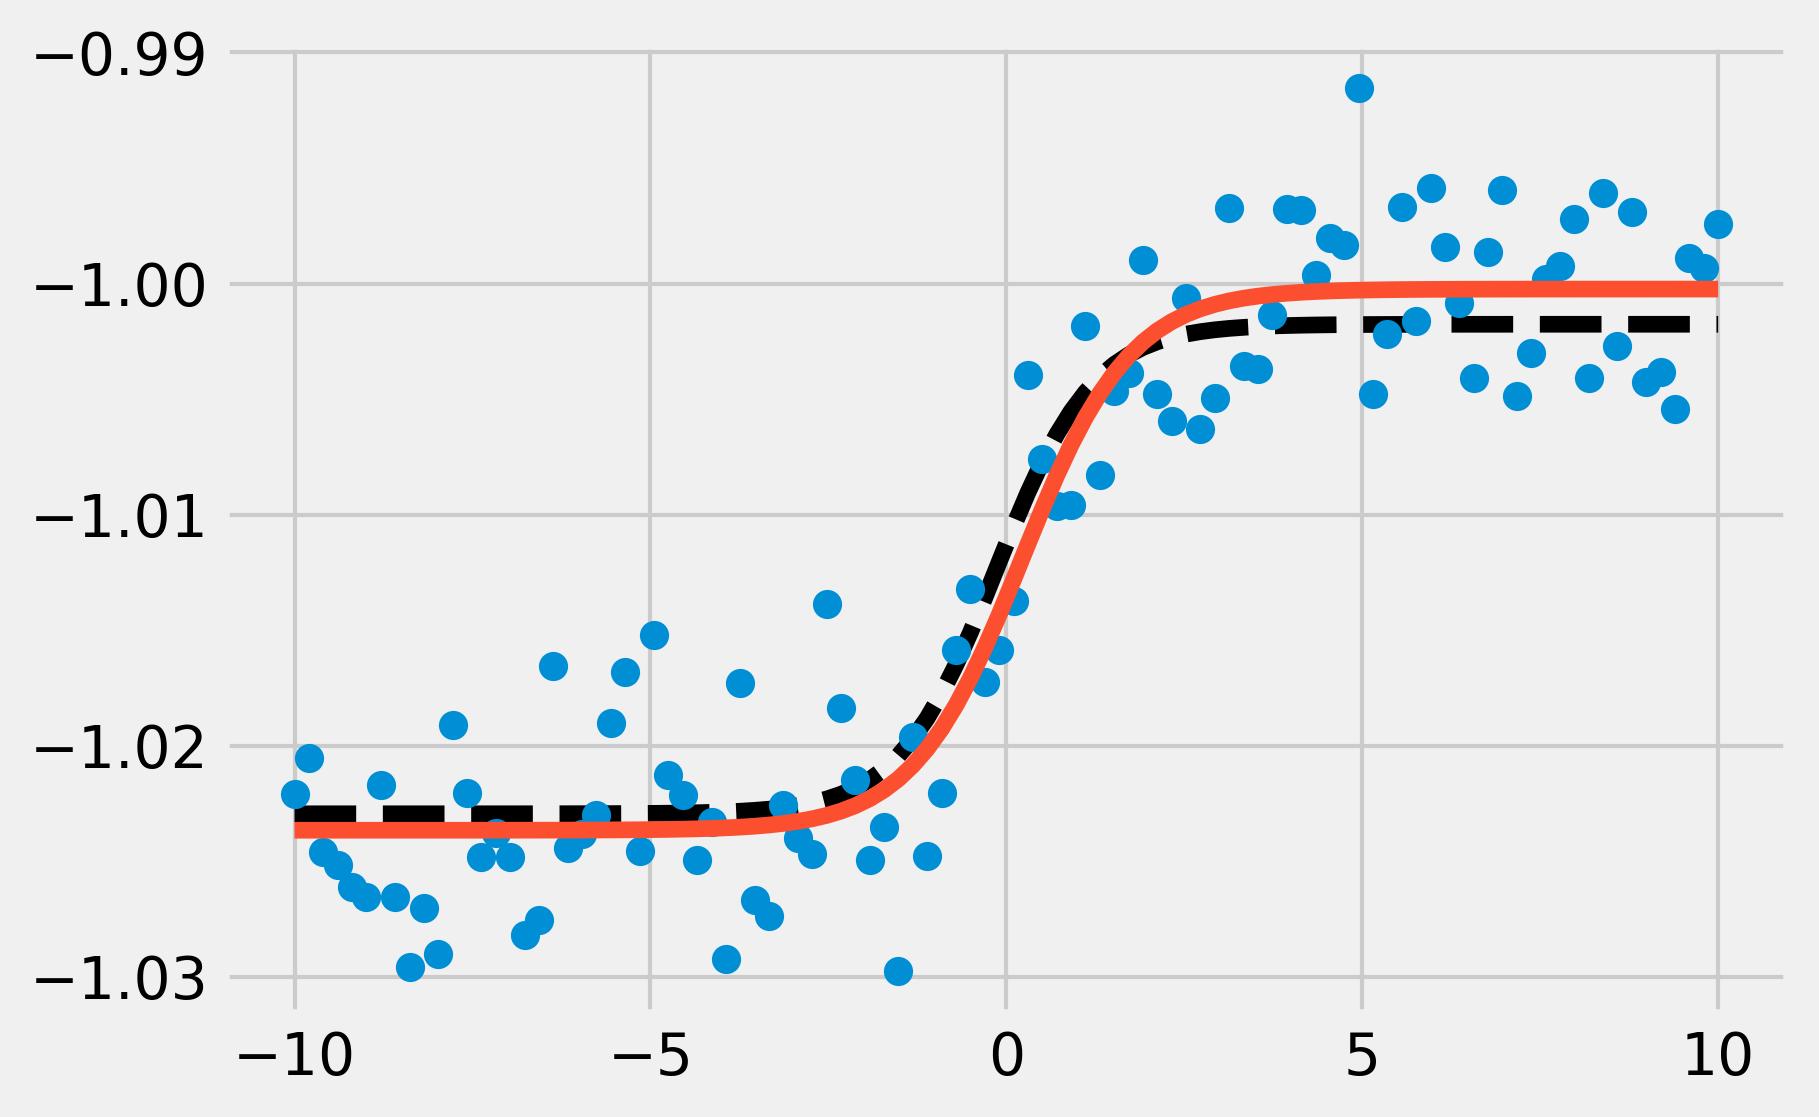 <matplotlib.figure.Figure at 0x6967e10>